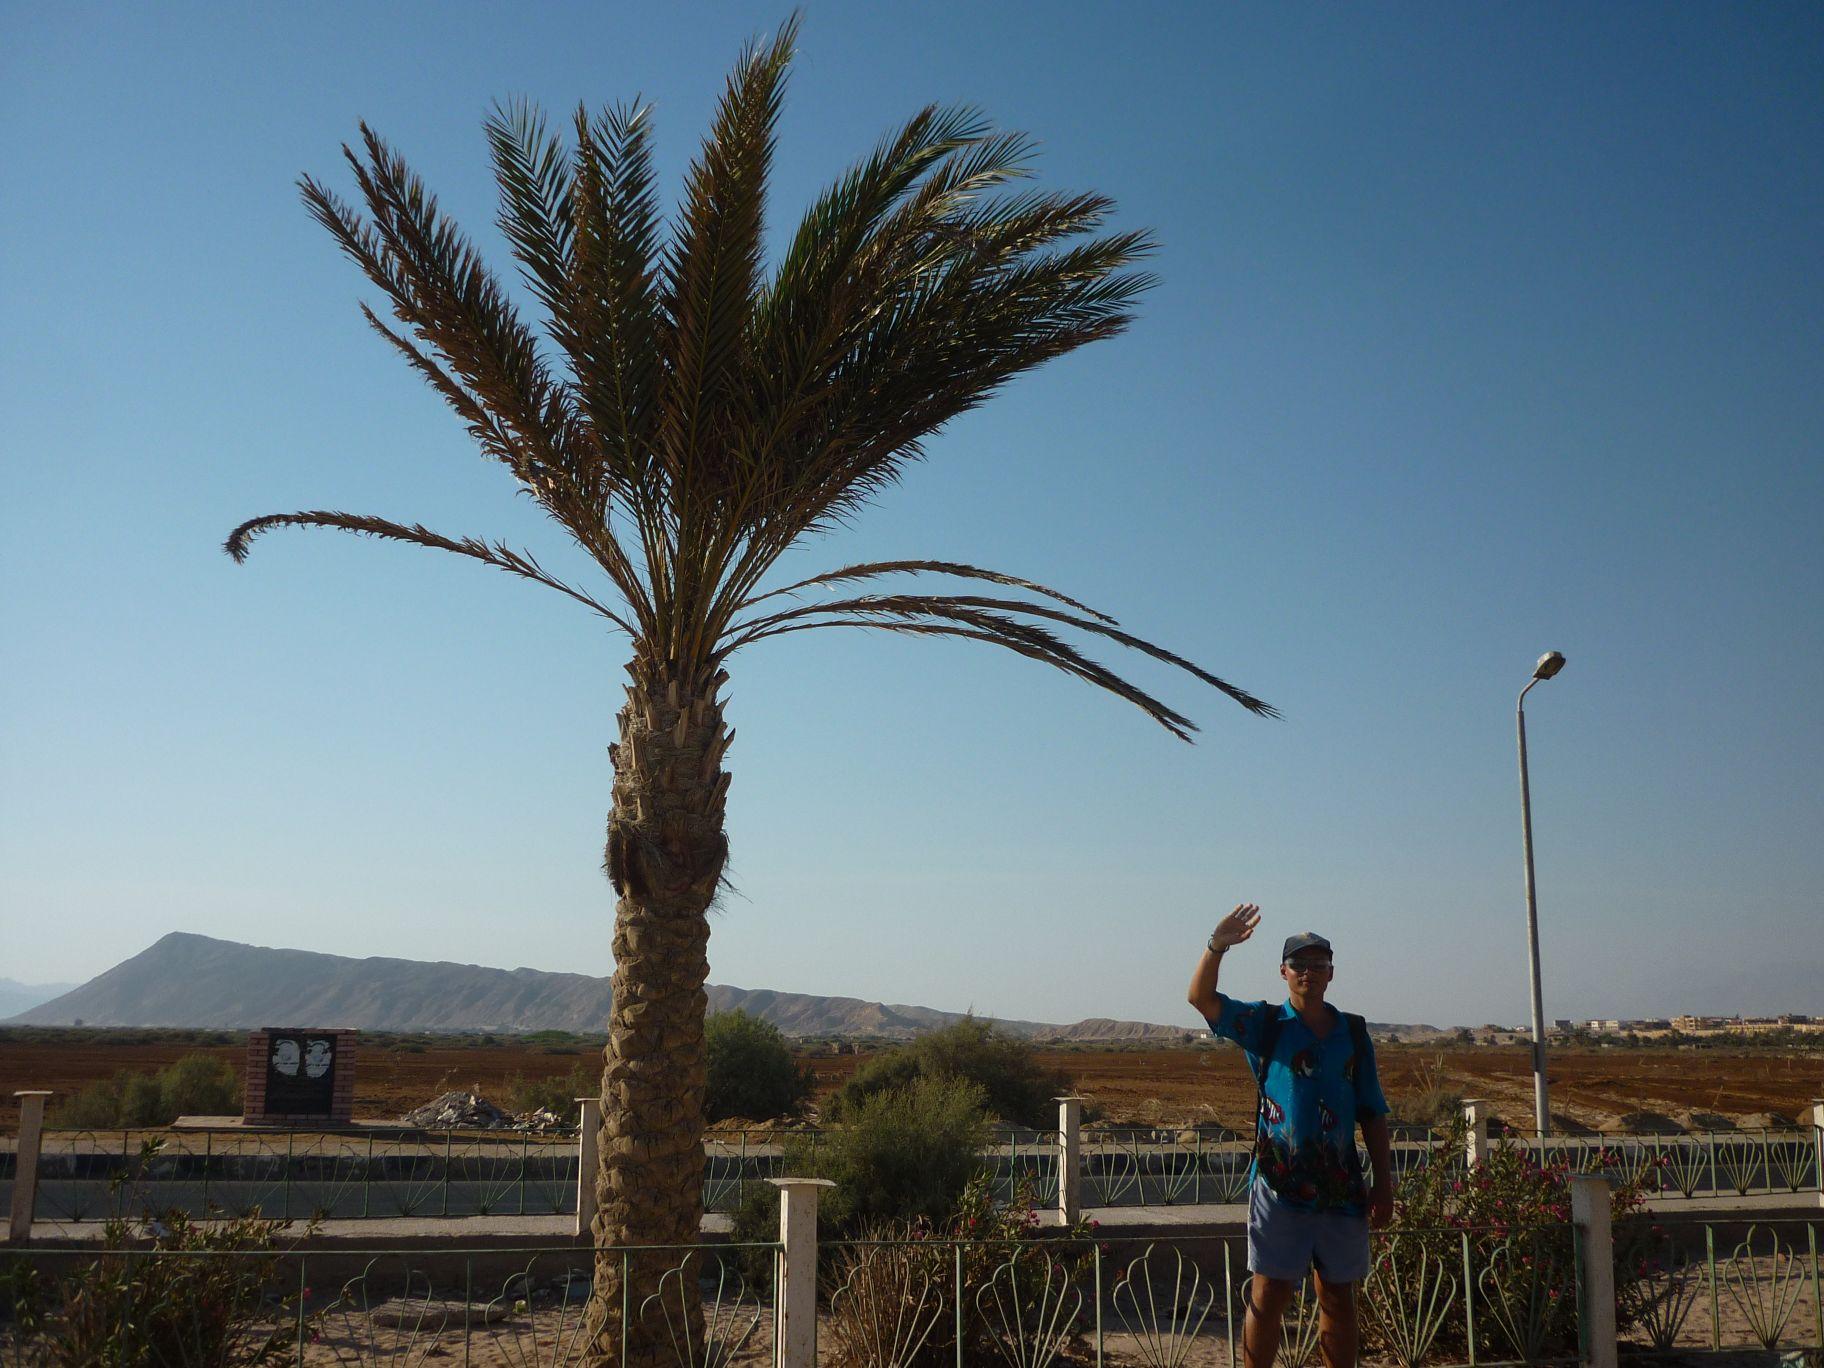 Dahab - El Tur - zdjęcia, atrakcje